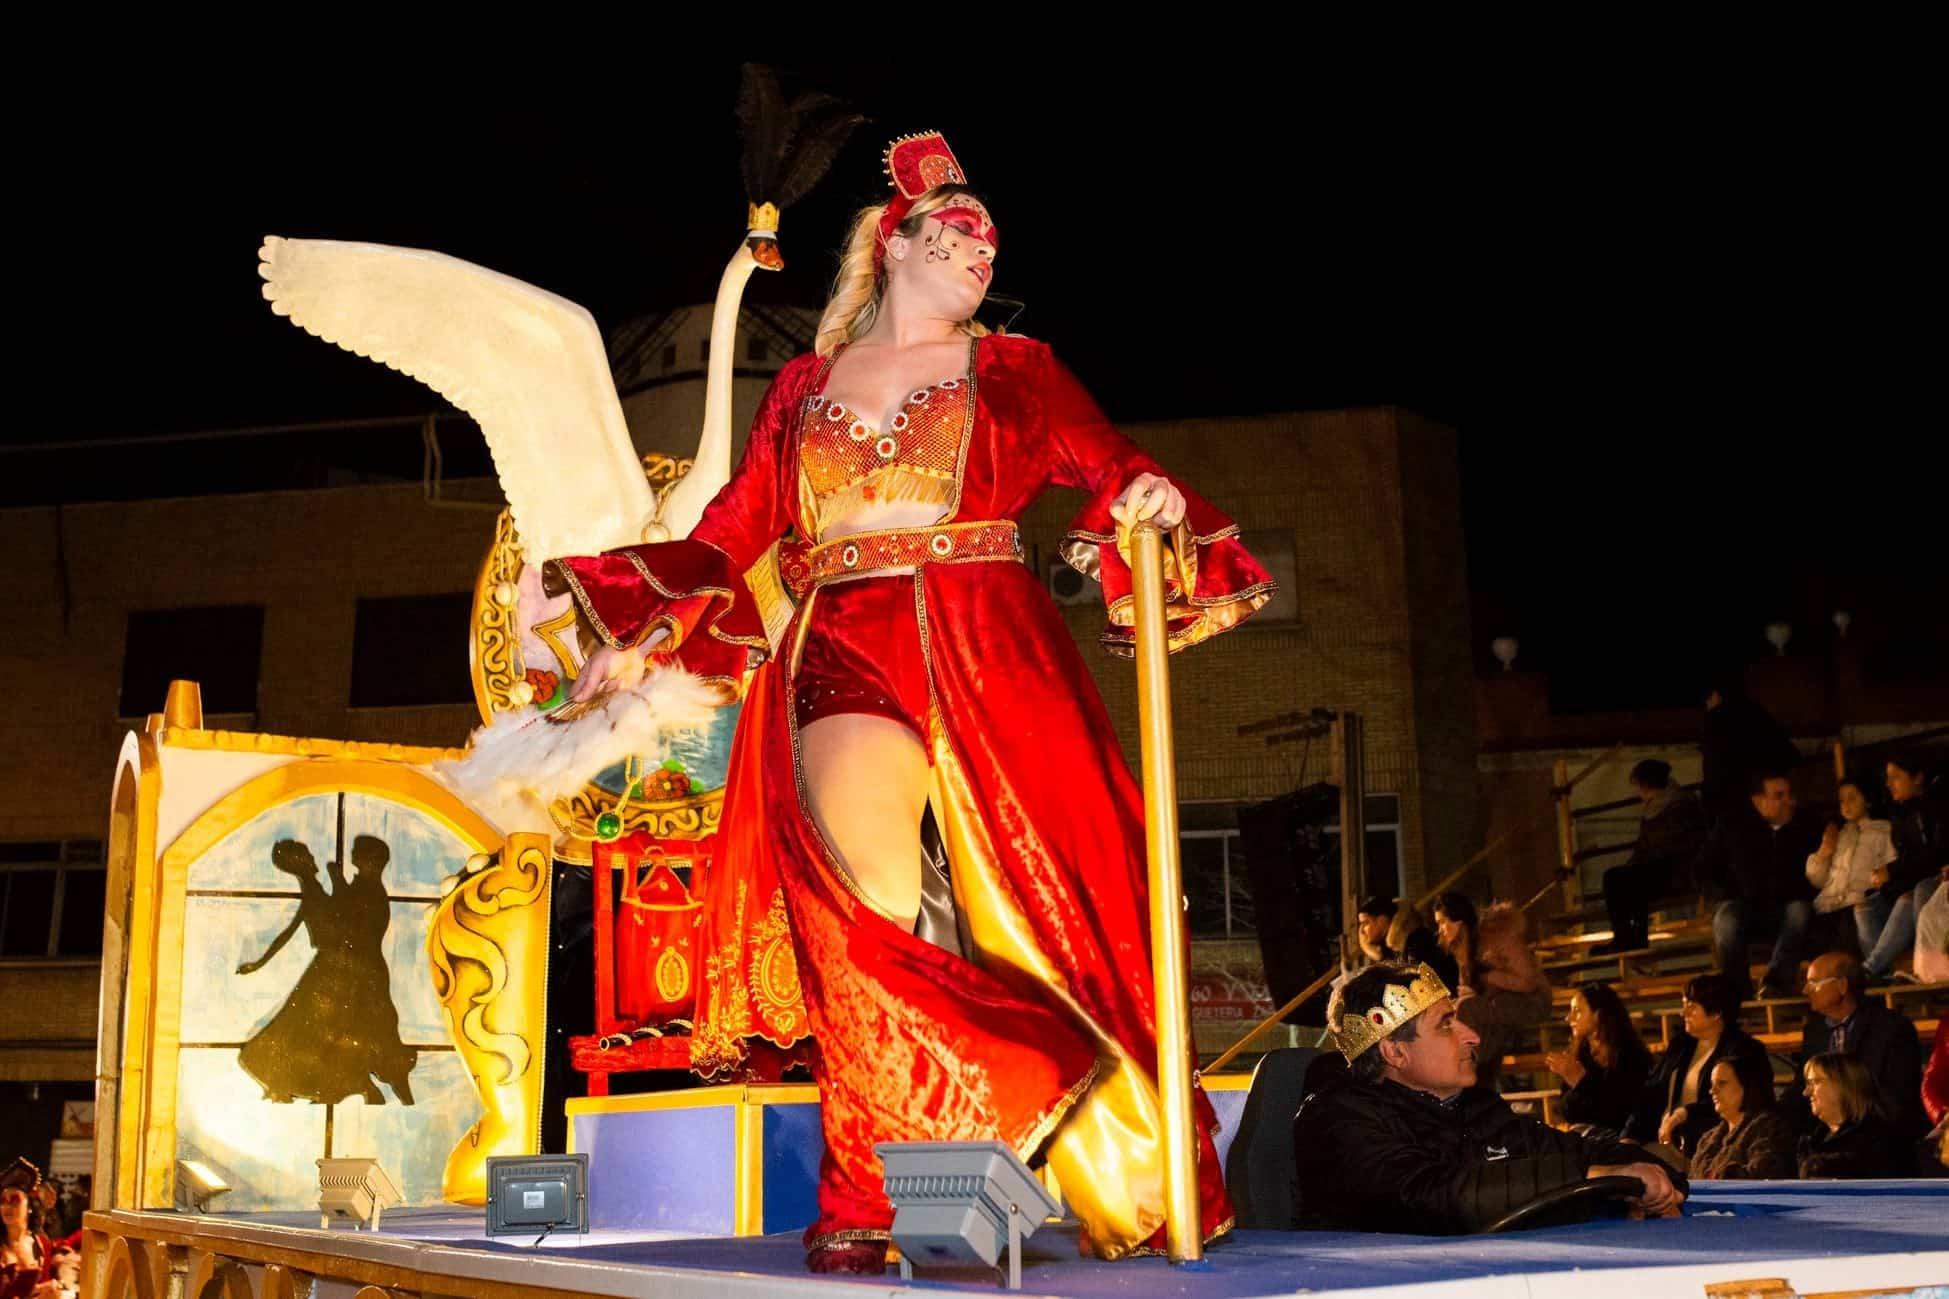 Carnaval de herencia 2020 ofertorio 47 - Selección de fotografías del Ofertorio del Carnaval de Herencia